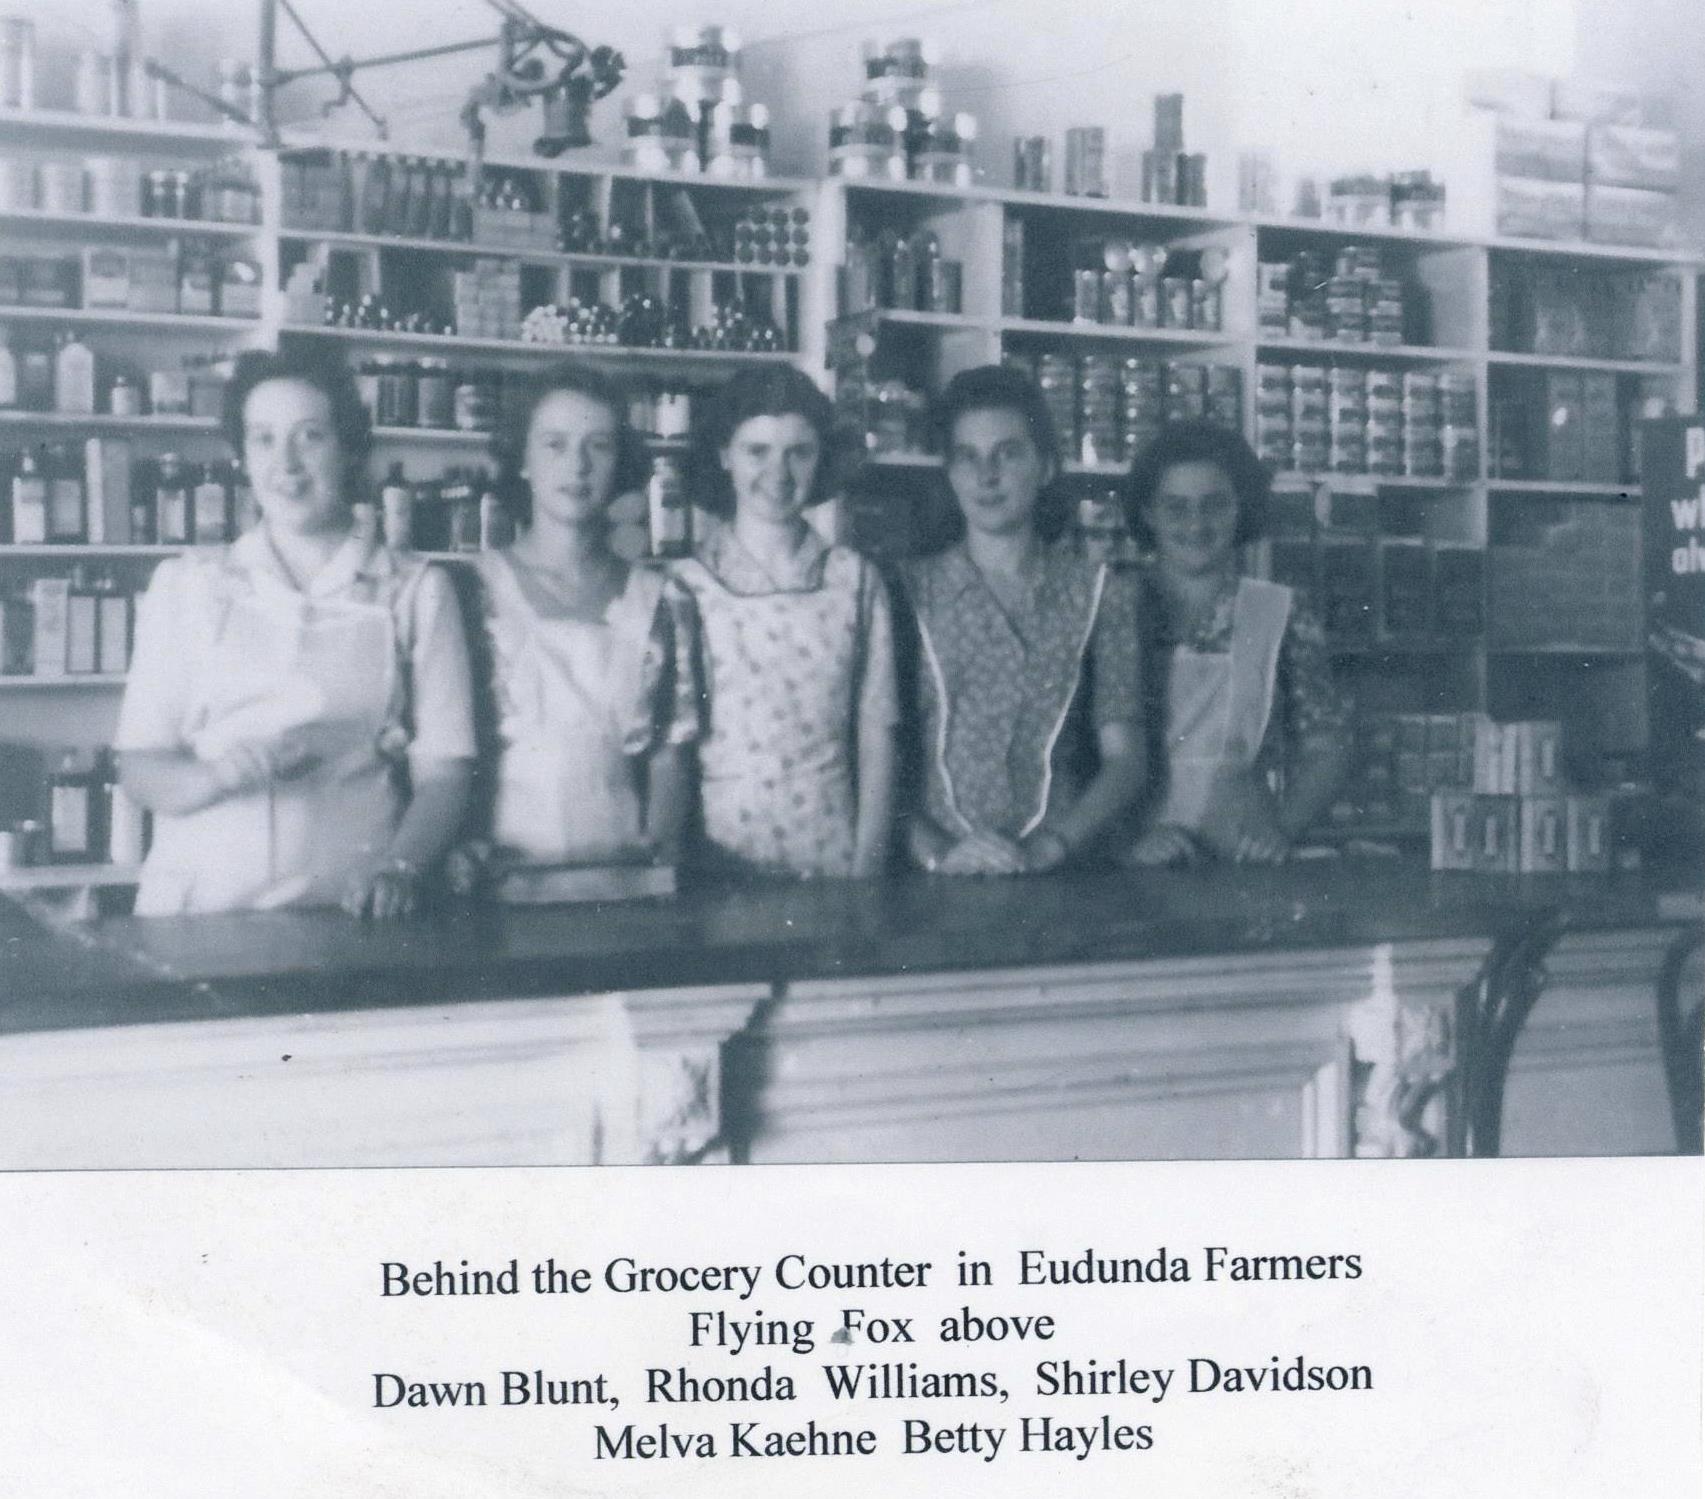 Eudunda Farmers' Counter Staff 1947